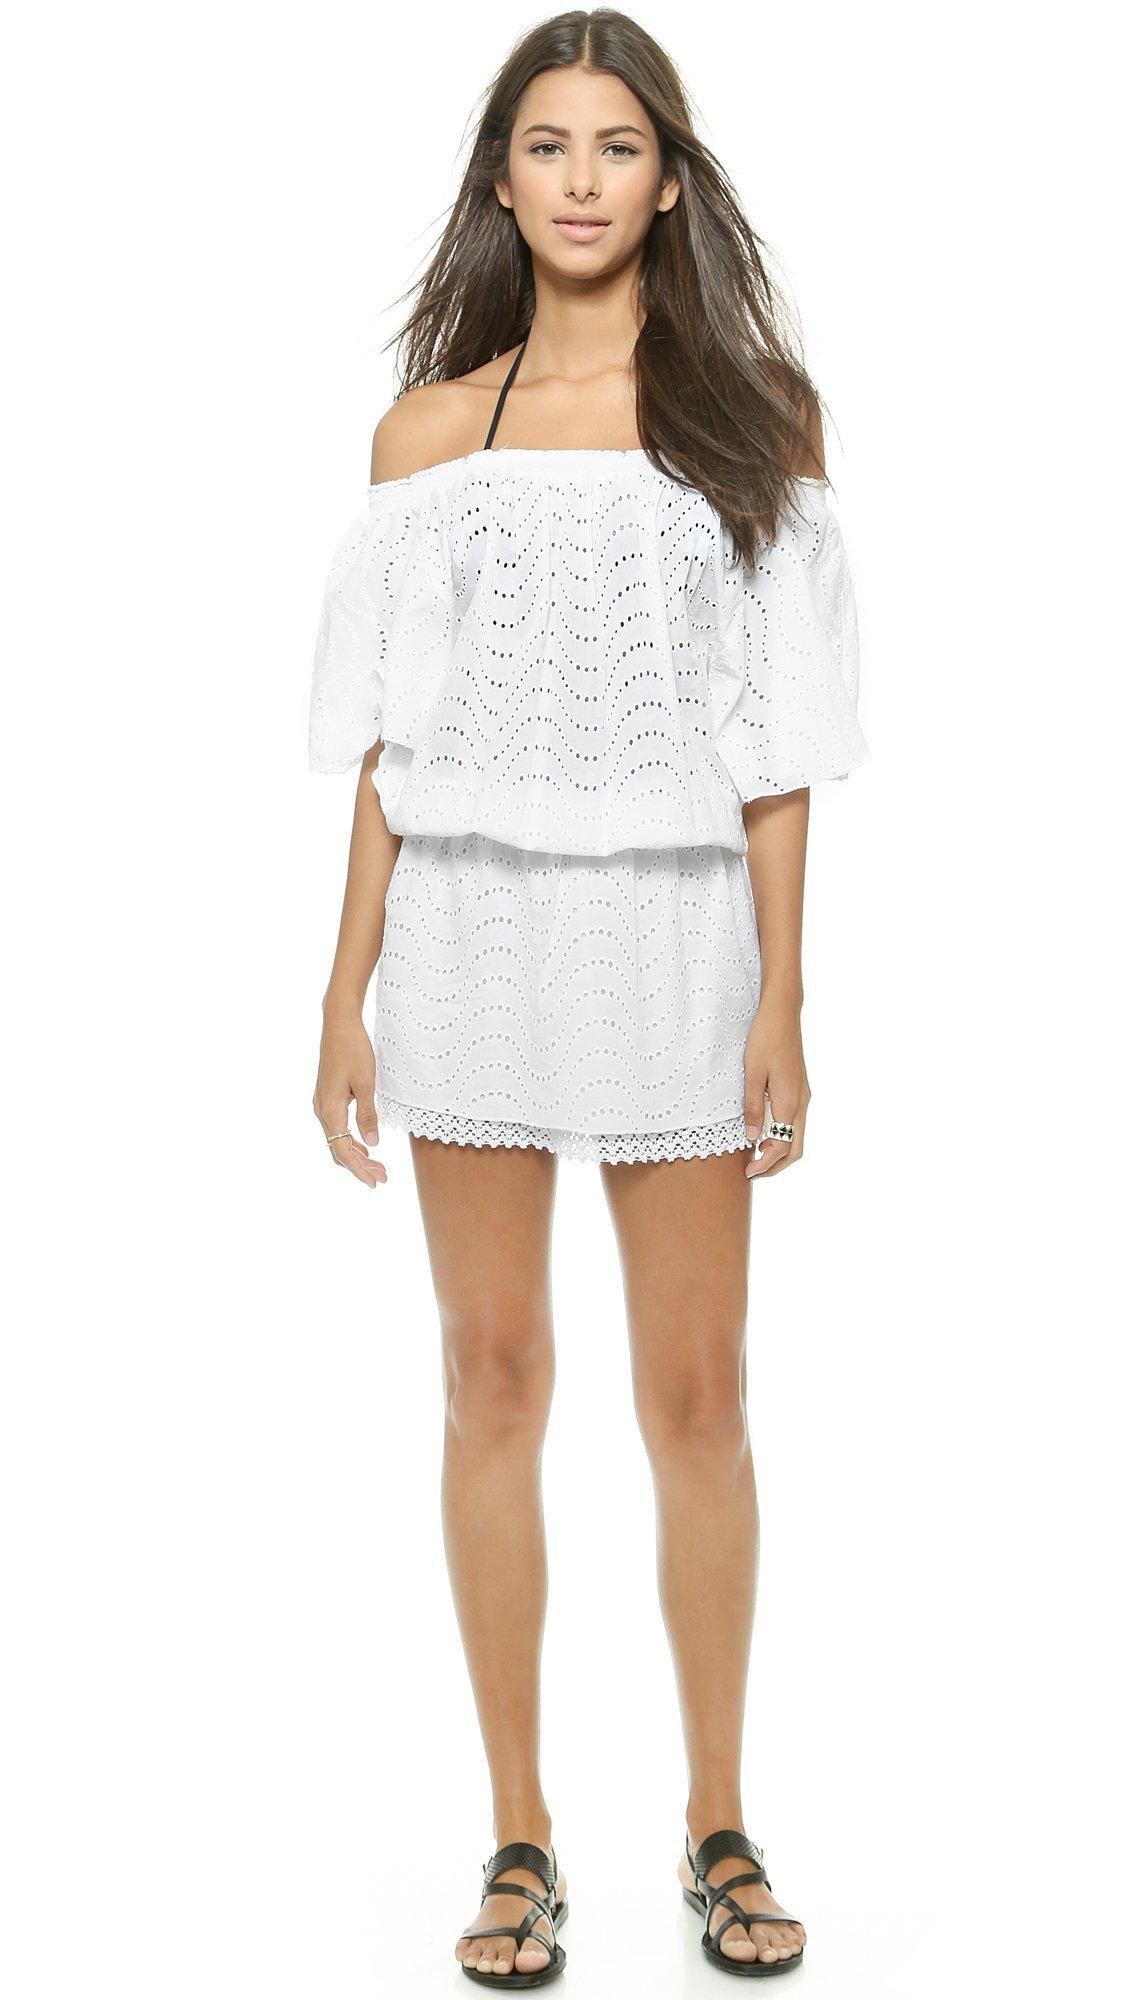 Melissa Odabash Women's Michea Cover Up Dress, White, Small by Melissa Odabash (Image #2)